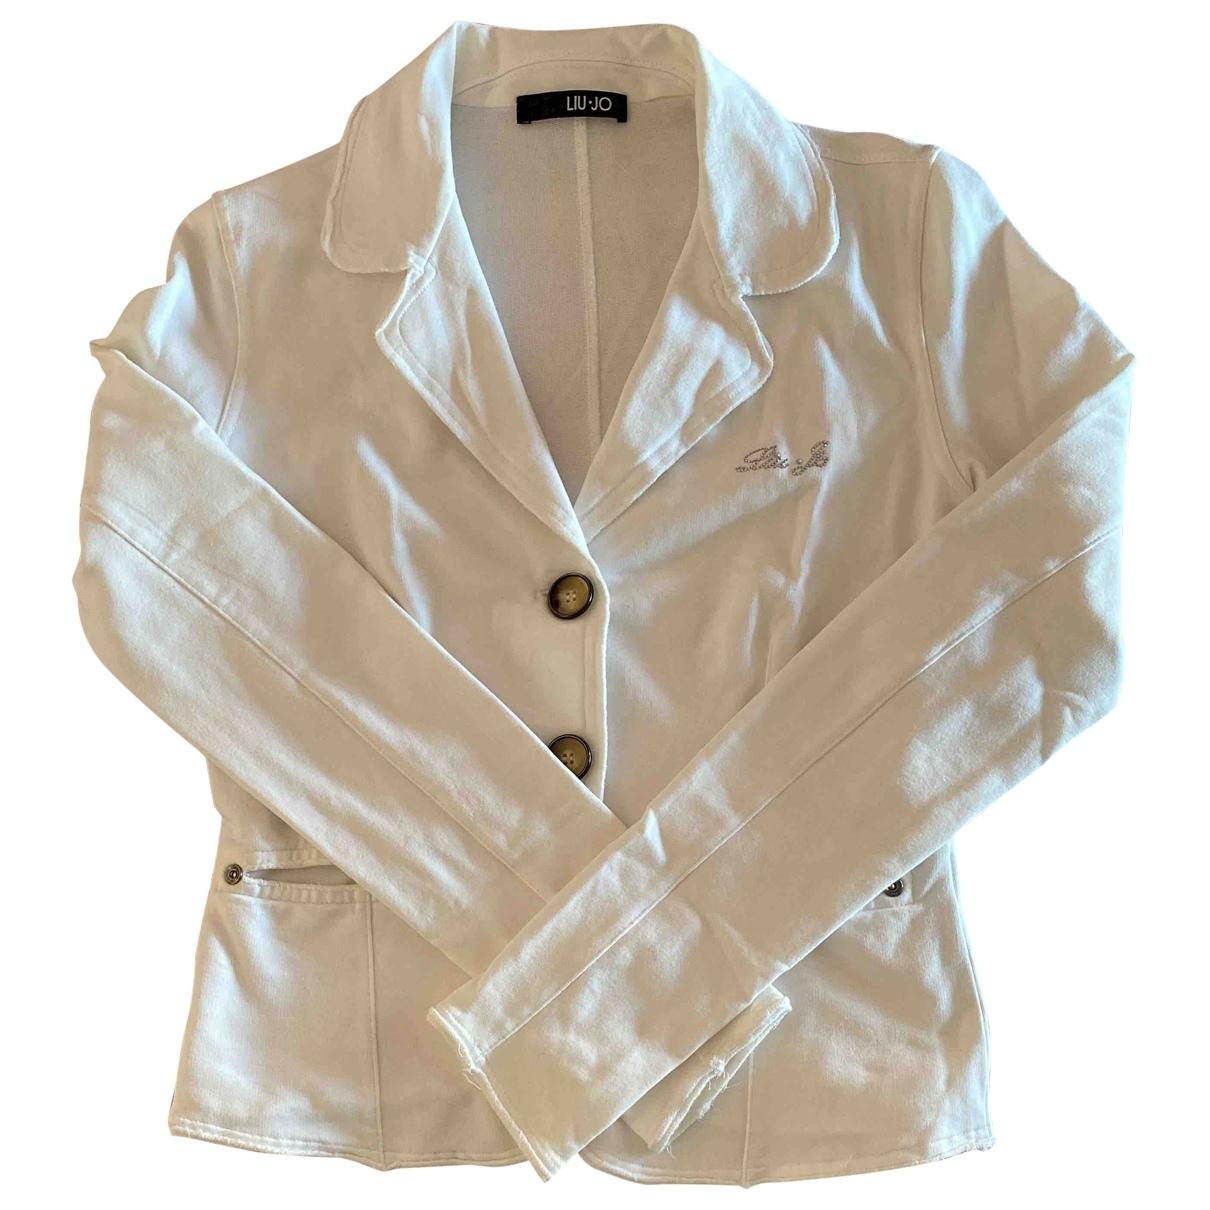 Liu.jo \N White Cotton jacket for Women 40 IT